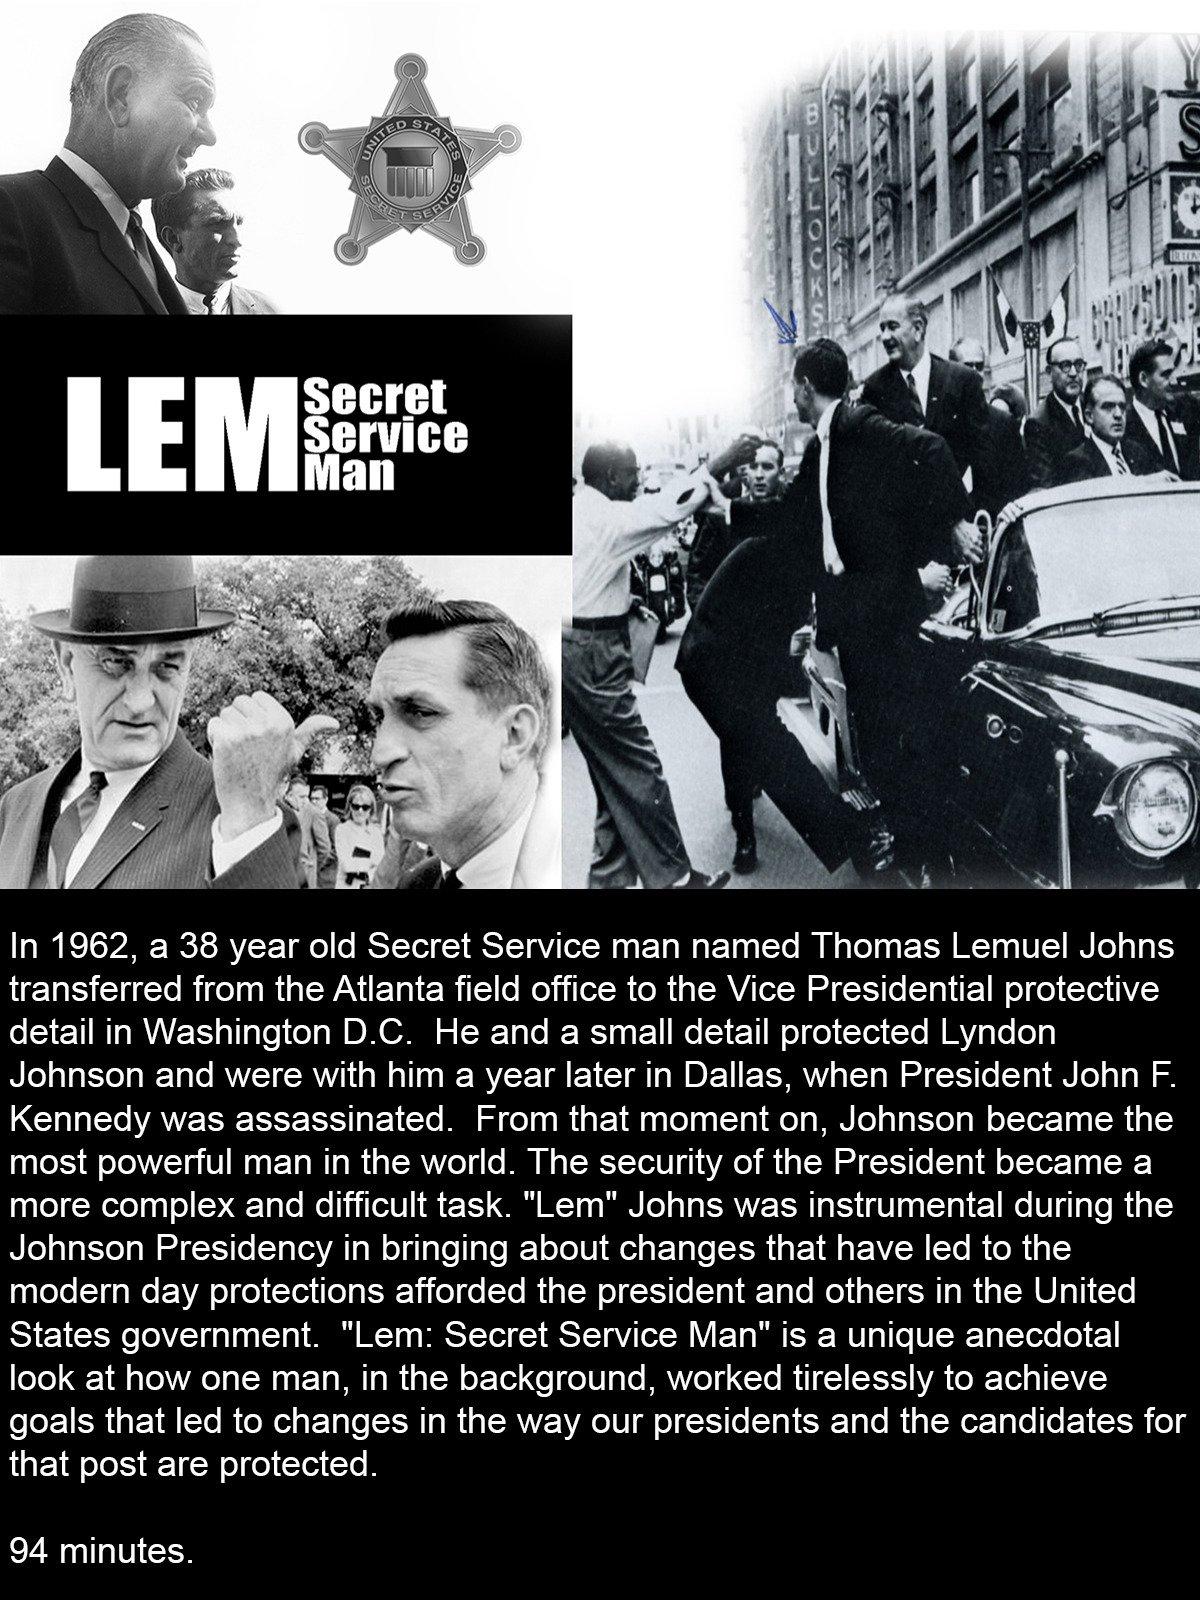 Lem Johns: Secret Service Man